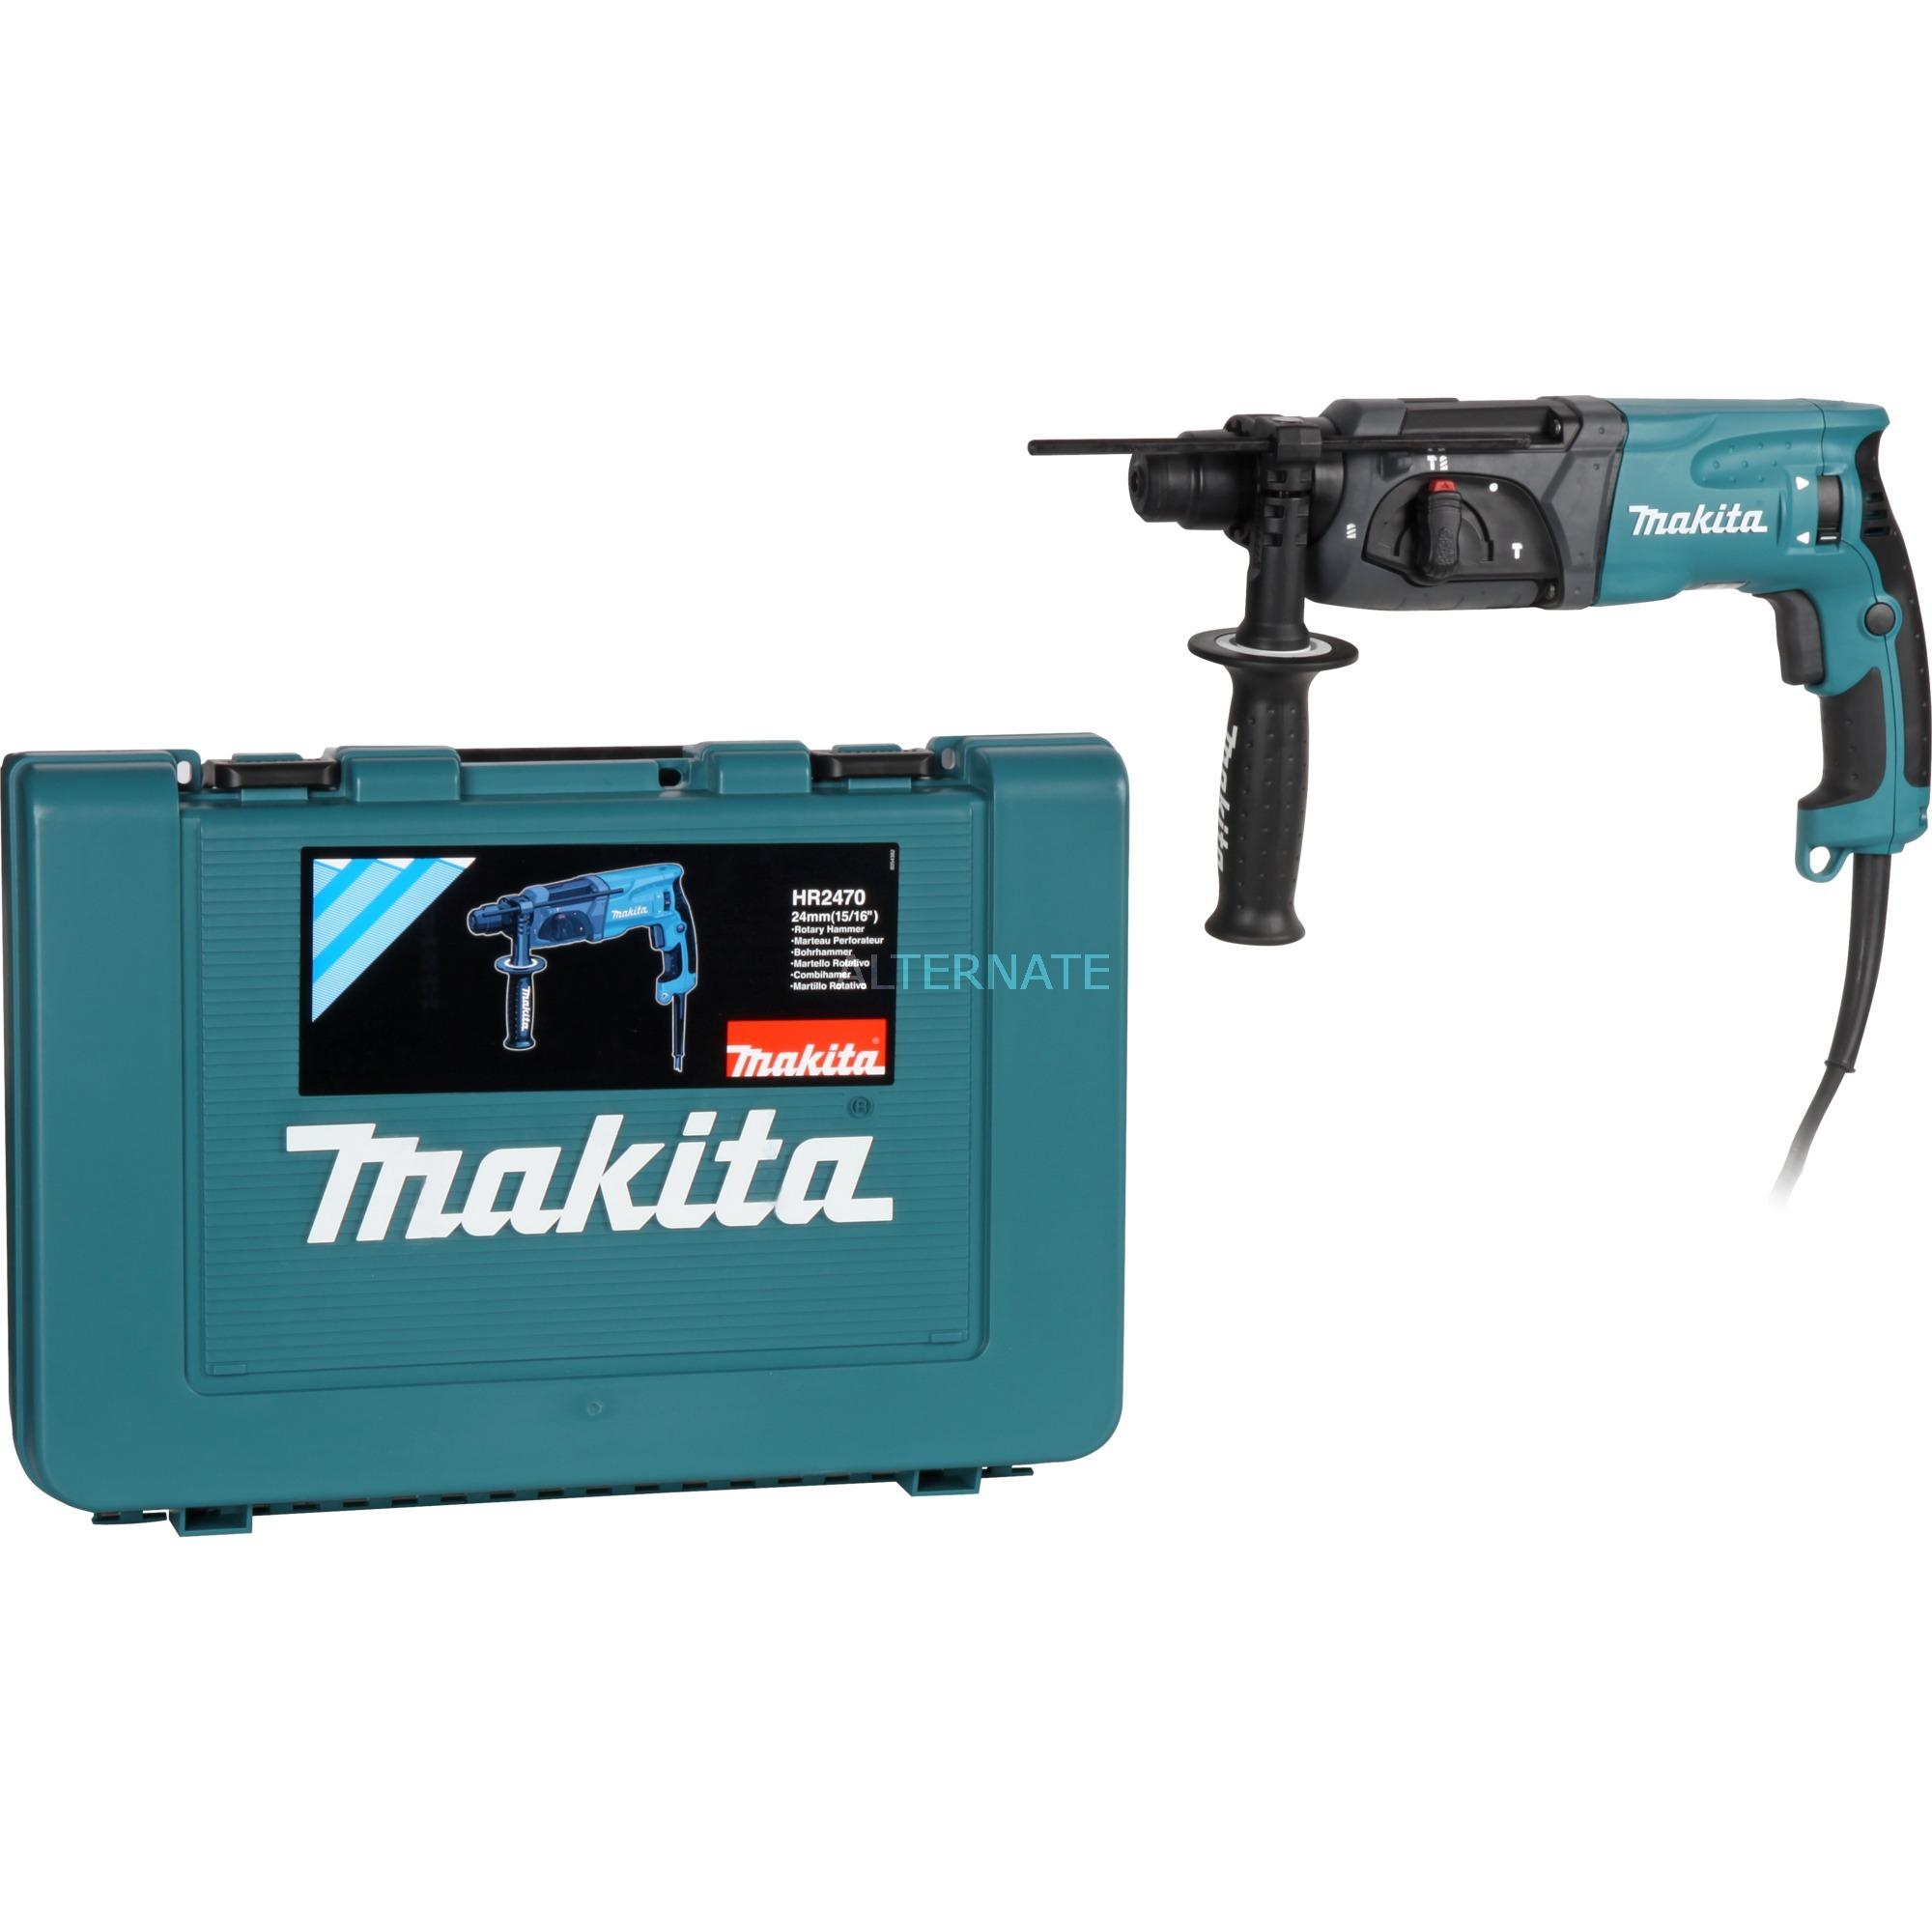 HR2470 rotary hammers 780 W, Martillo perforador